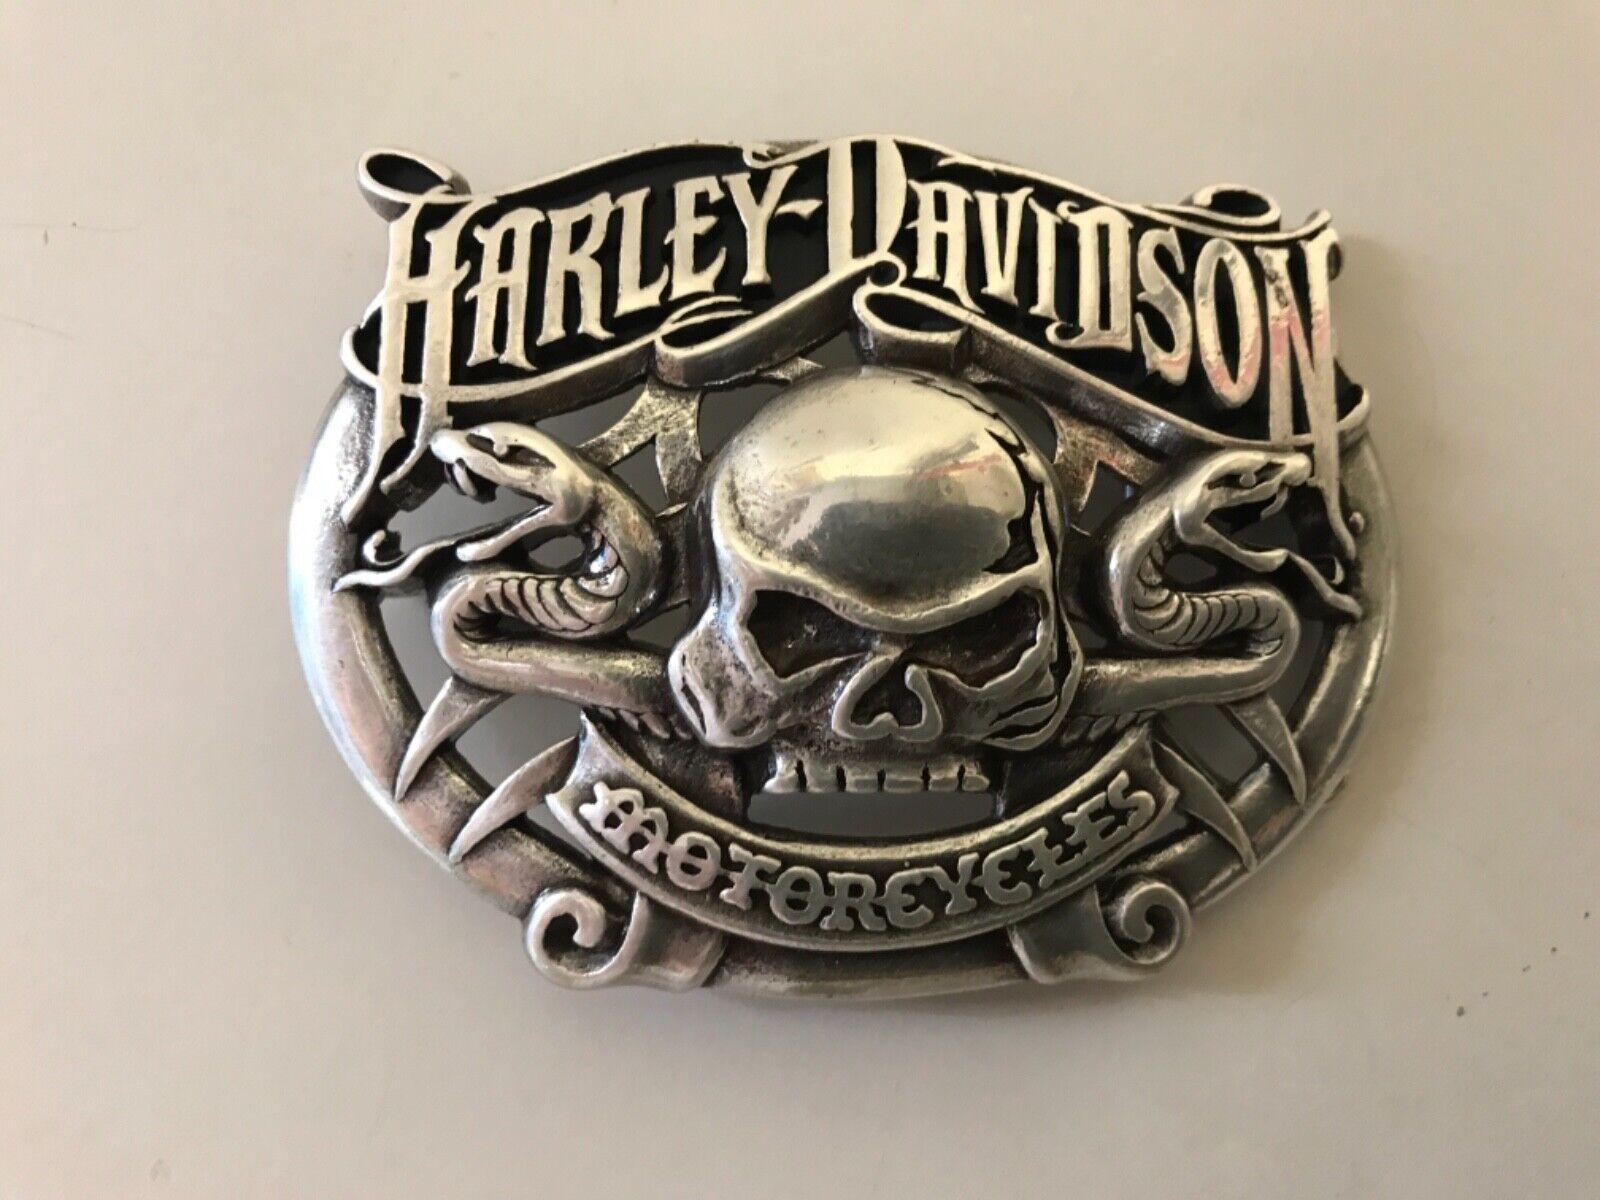 Harley-Davidson rare, men's Skull with Snakes belt buckle .Silver plaited.